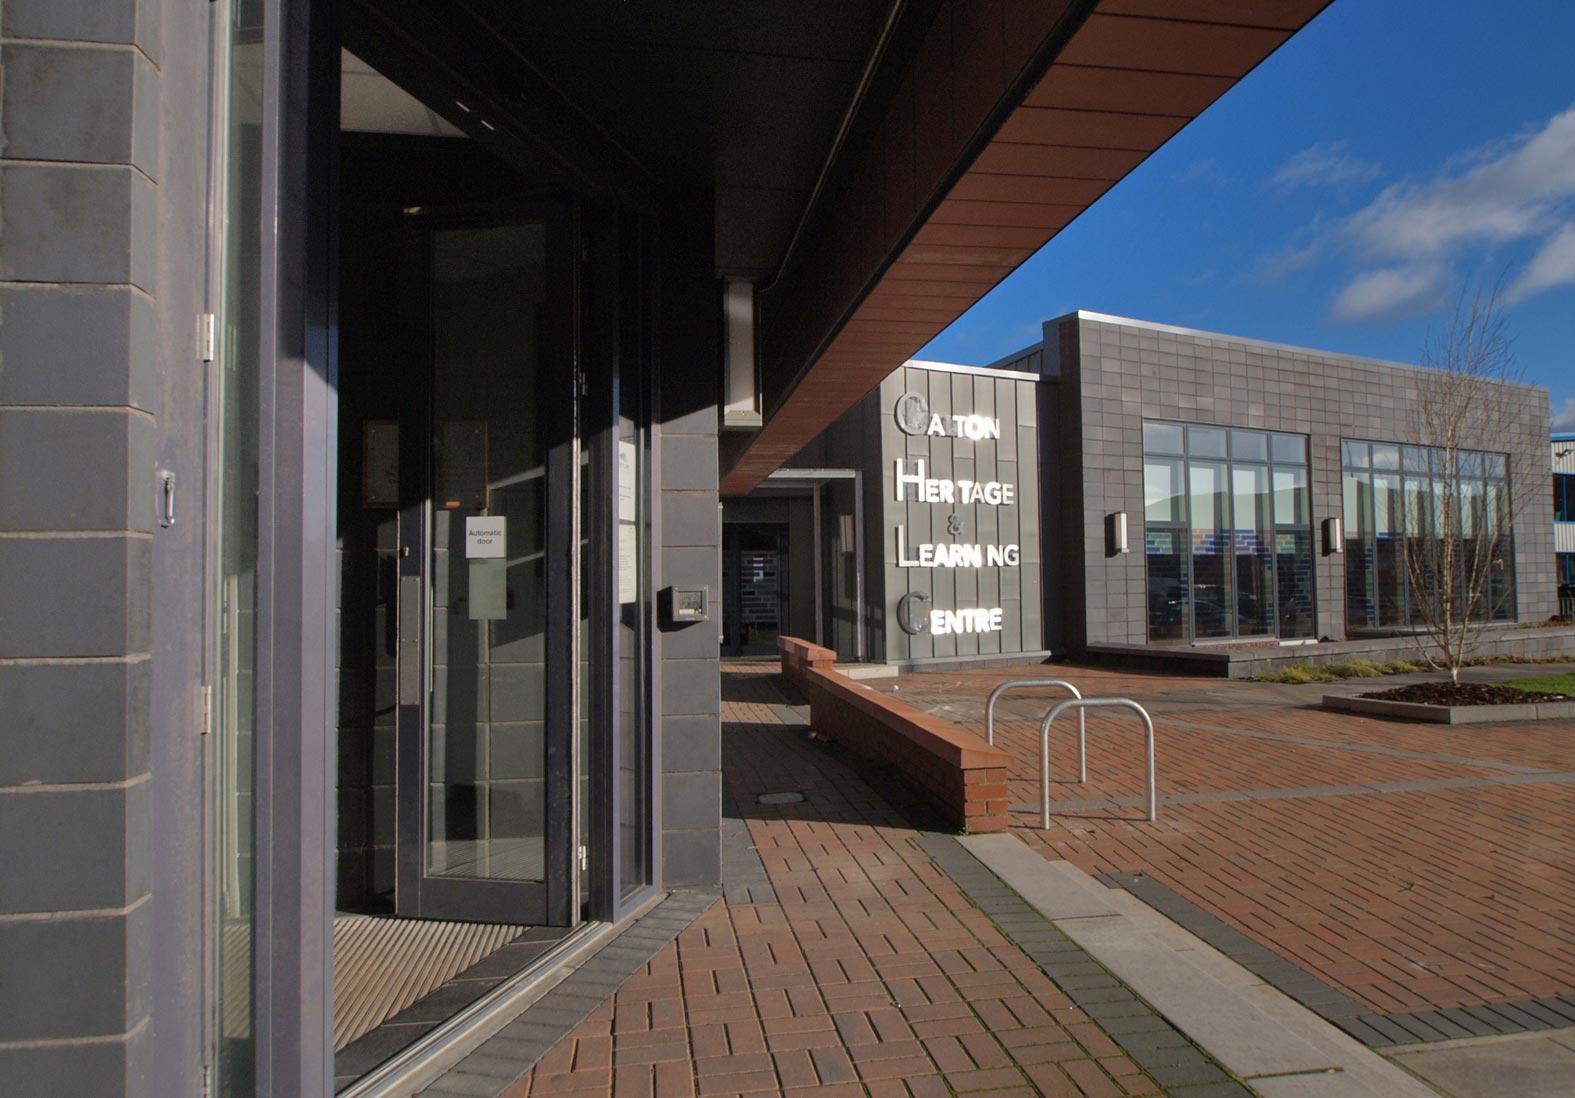 Calton Heritage & Learning Centre | MAST Architects